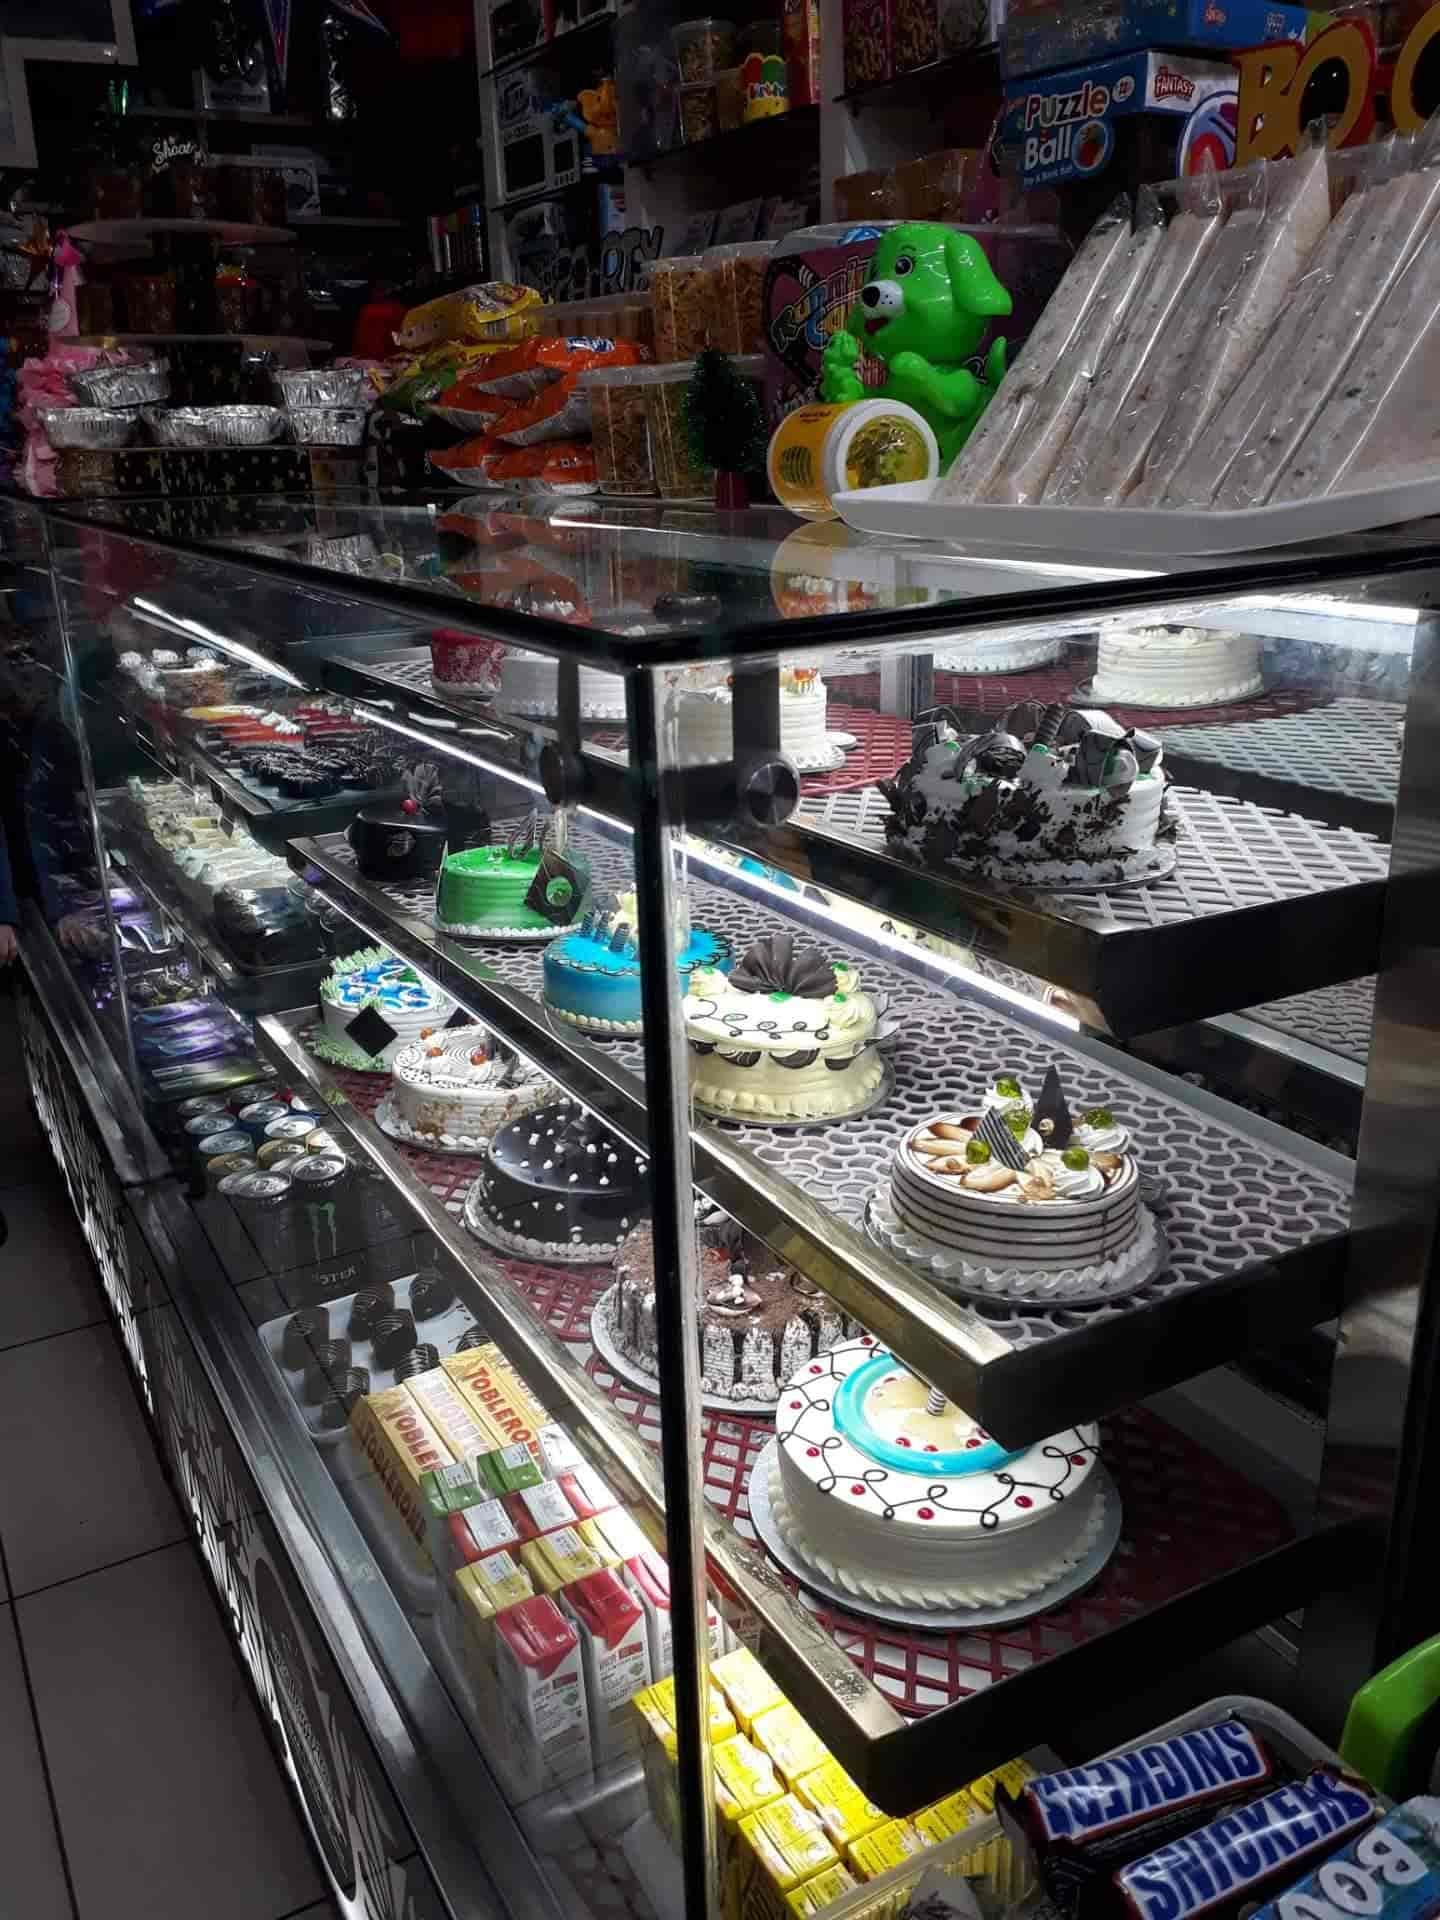 Rolling Pin Cake Shop, Muzaffar Nagar City - Bakeries in